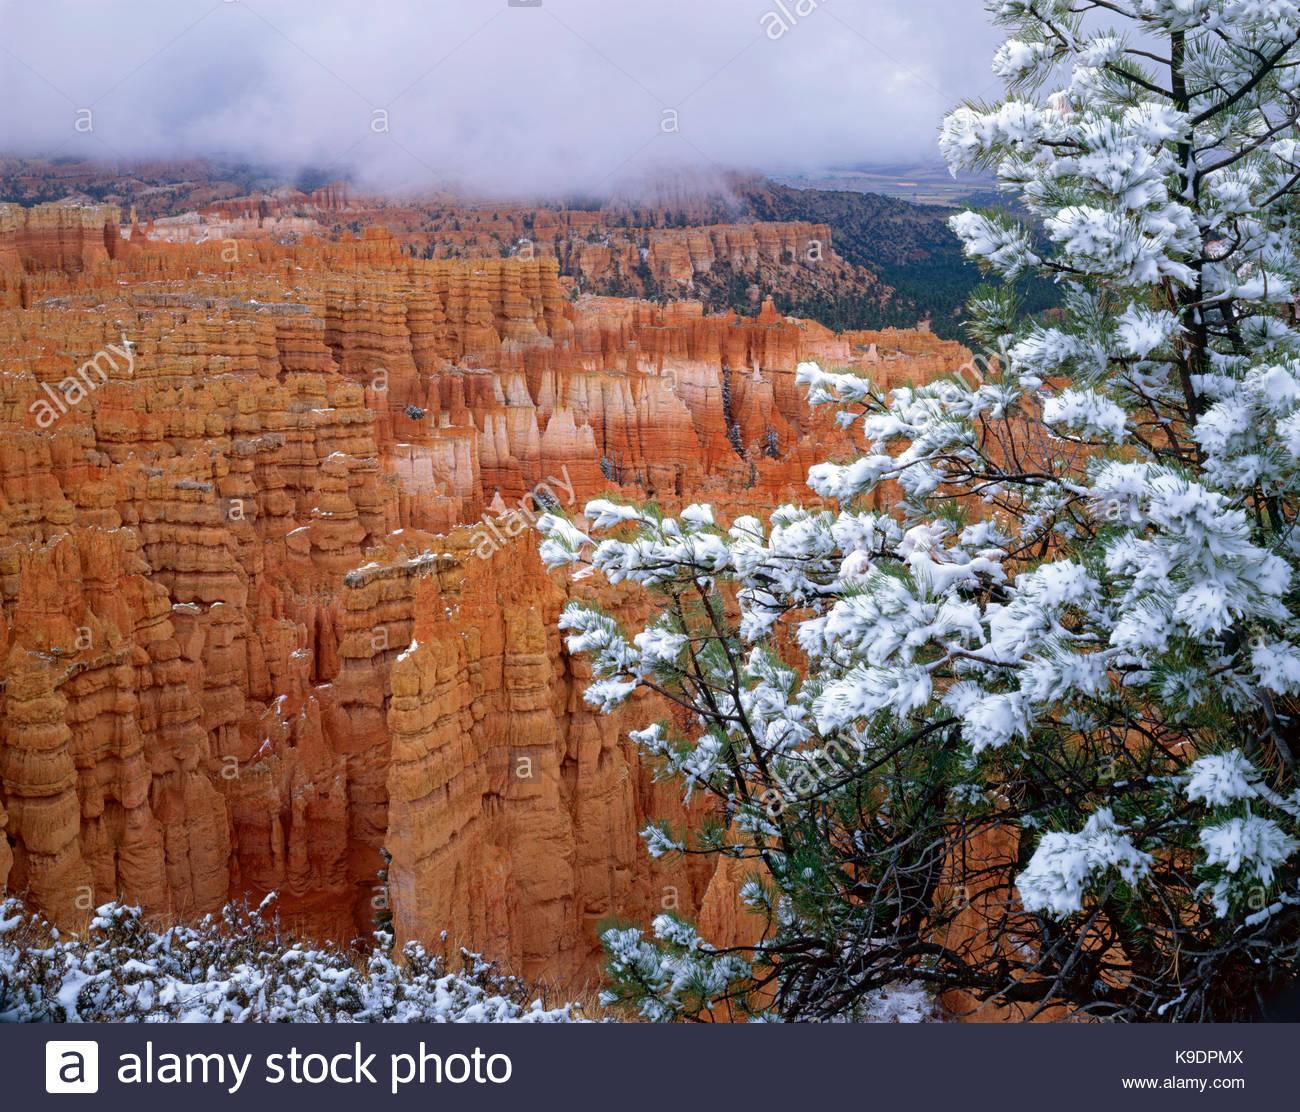 Tormenta en Ciudad Silenciosa, Bryce Canyon National Park, Utah Imagen De Stock